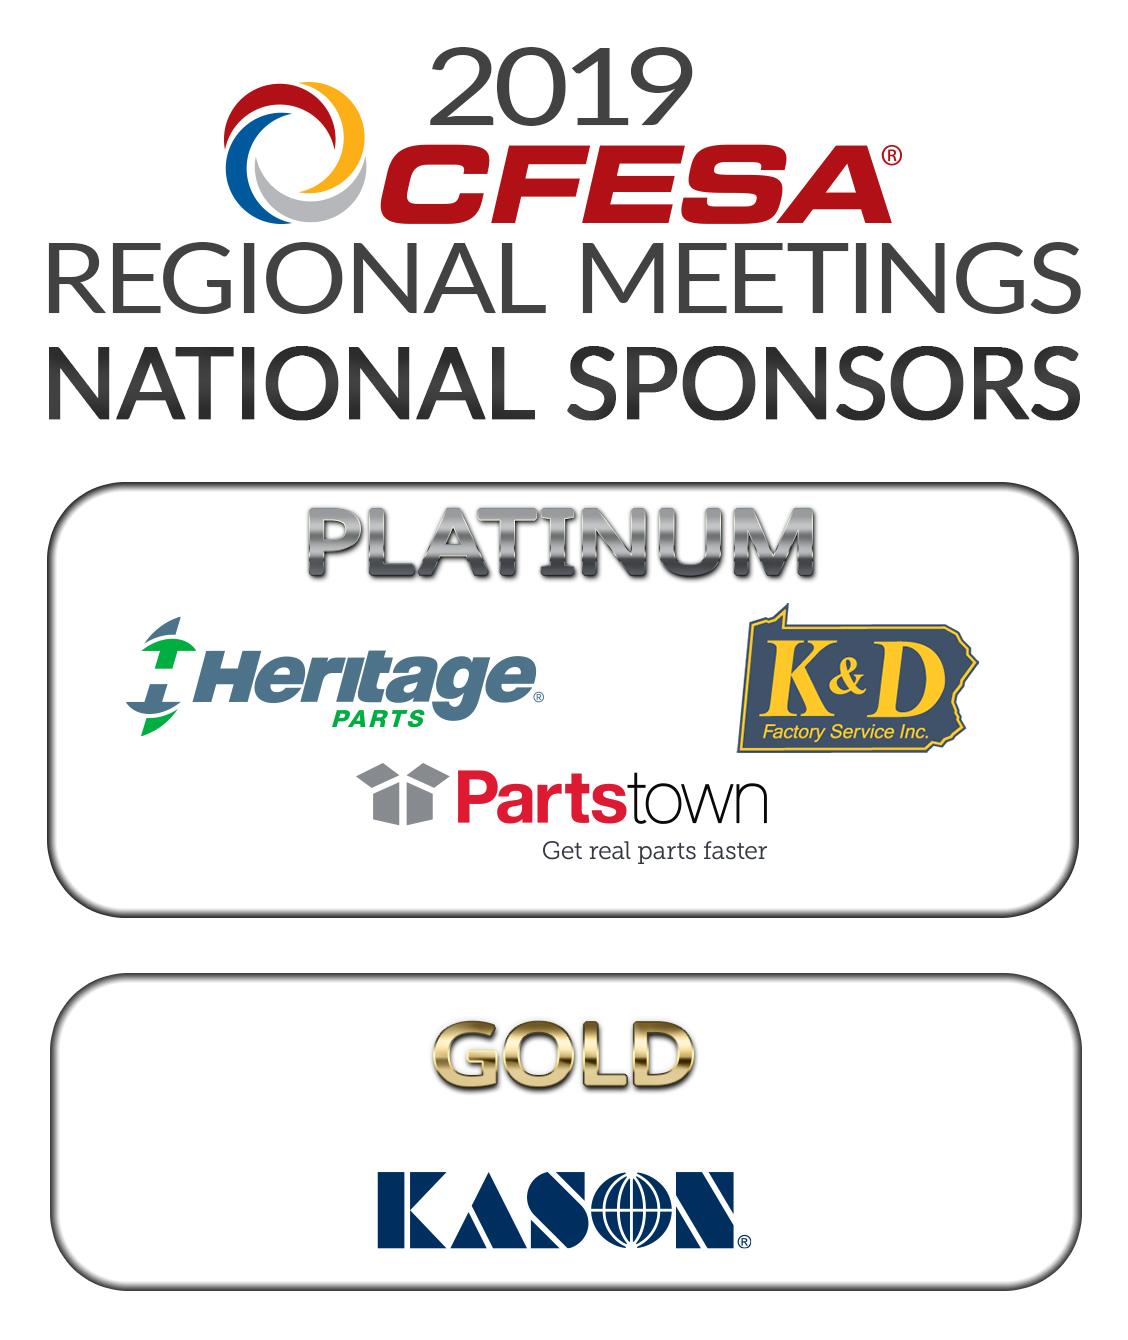 2019 CFESA Regional Meeting National Sponsors